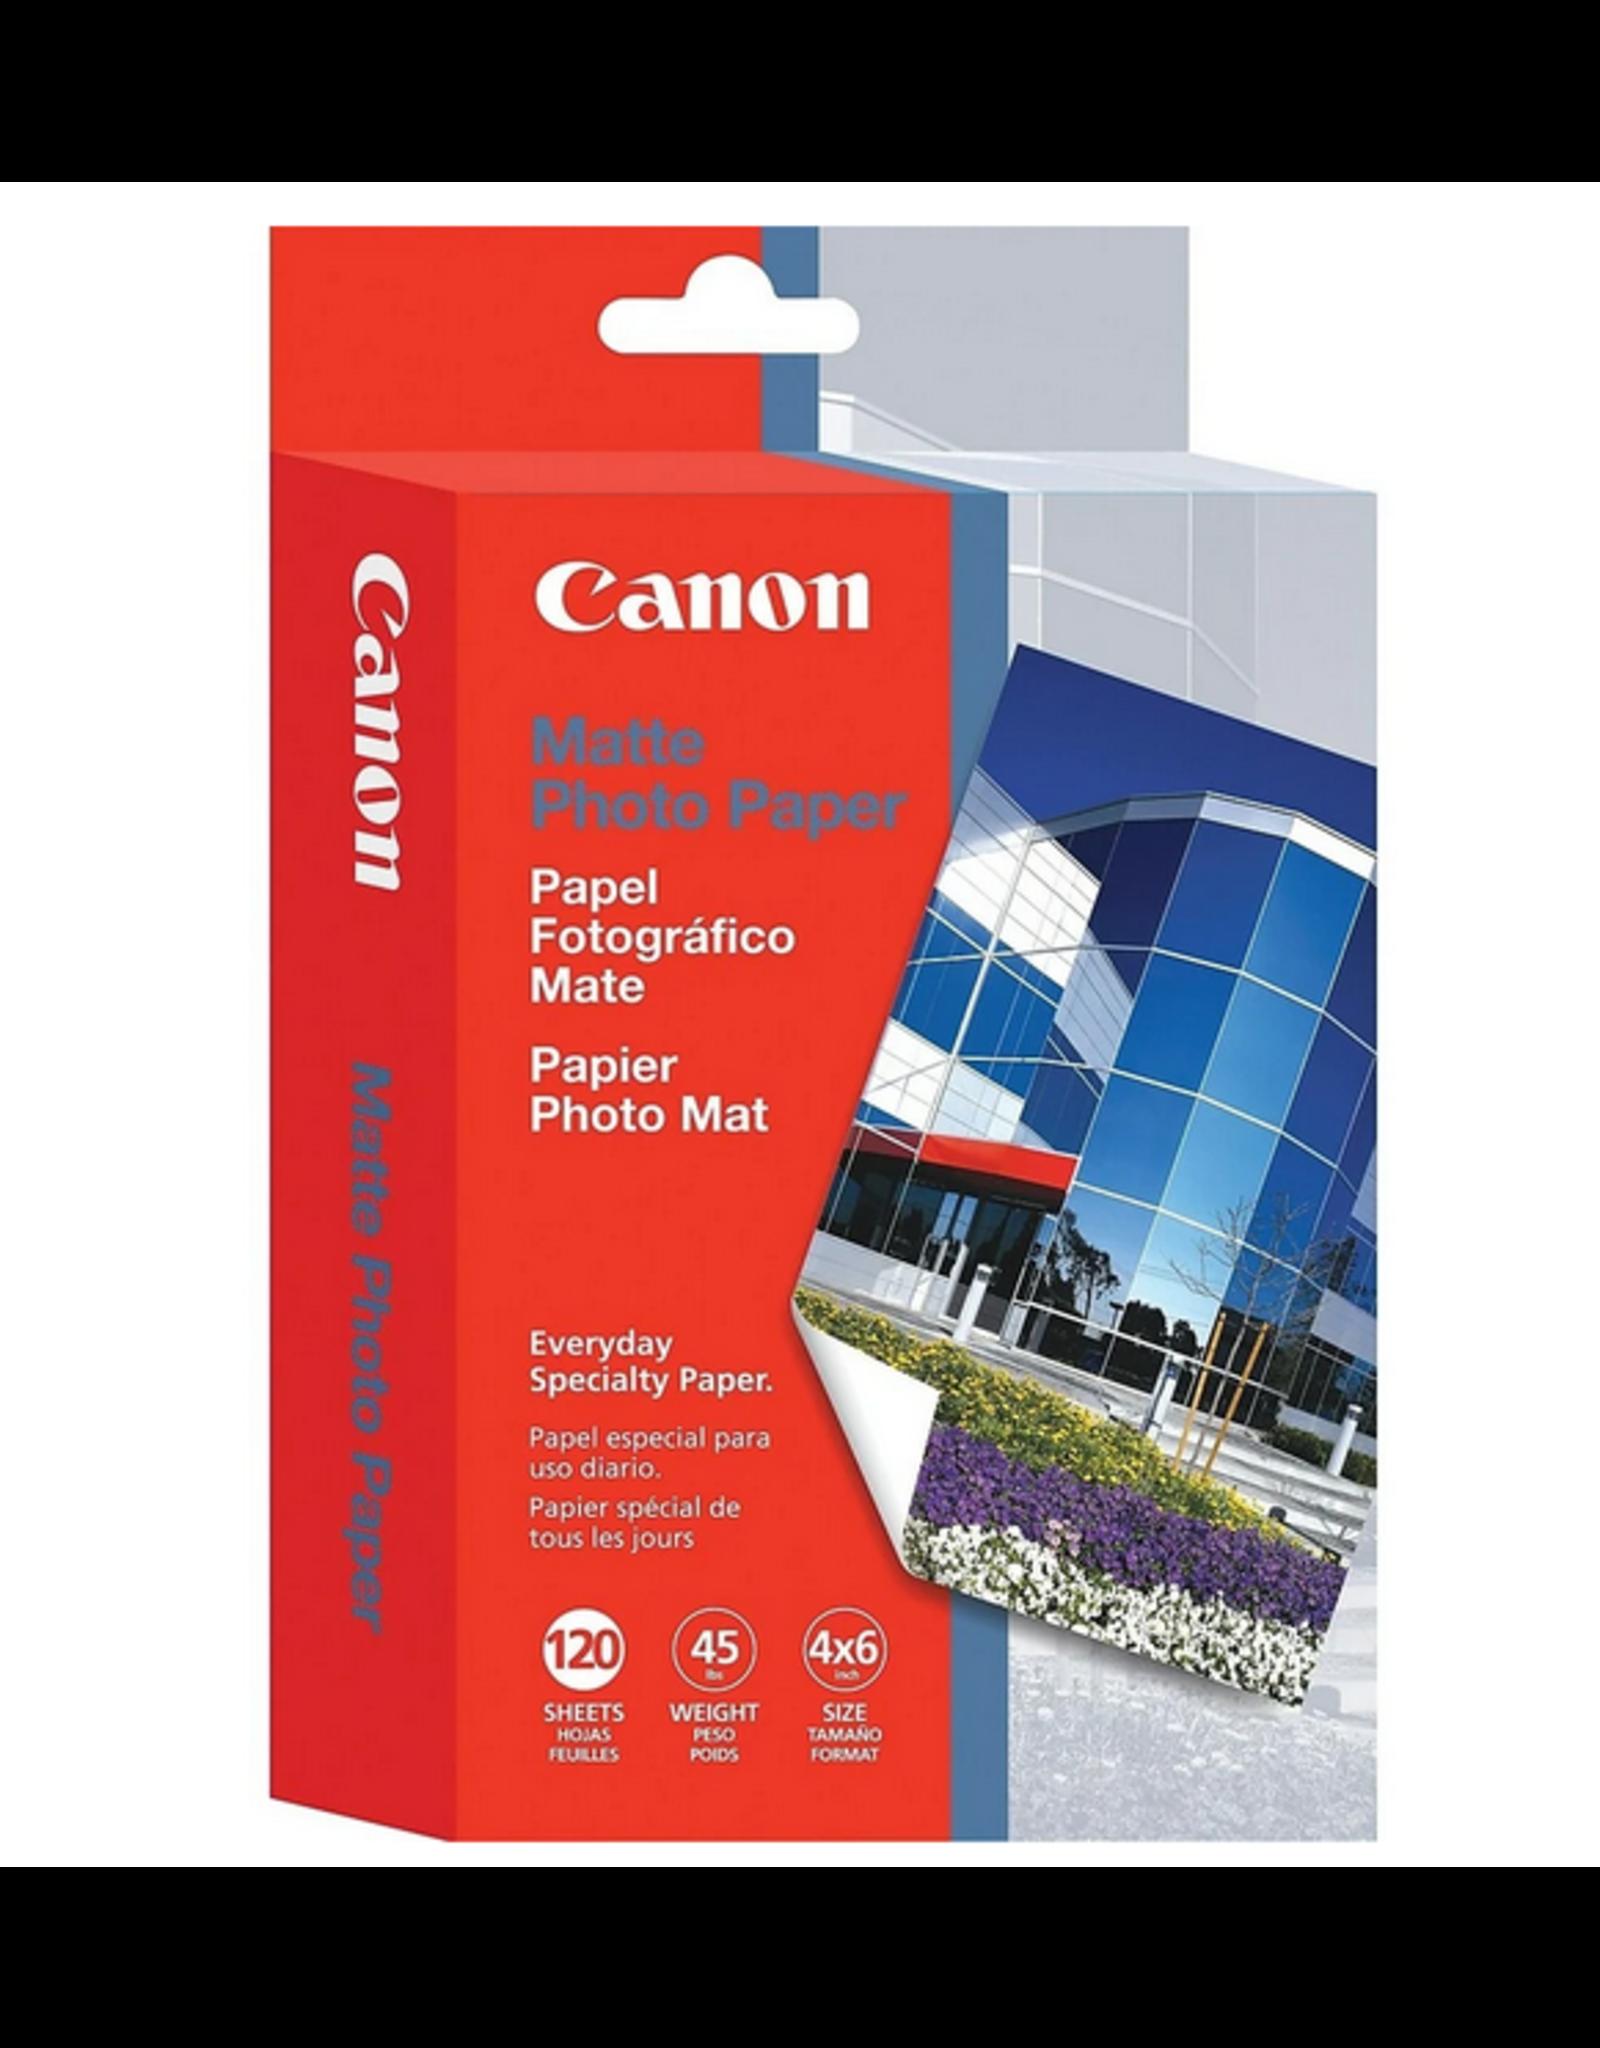 "Canon Canon MP-101 Inkjet Photo Paper 4"" x 6"" Matte 120 Sheets"